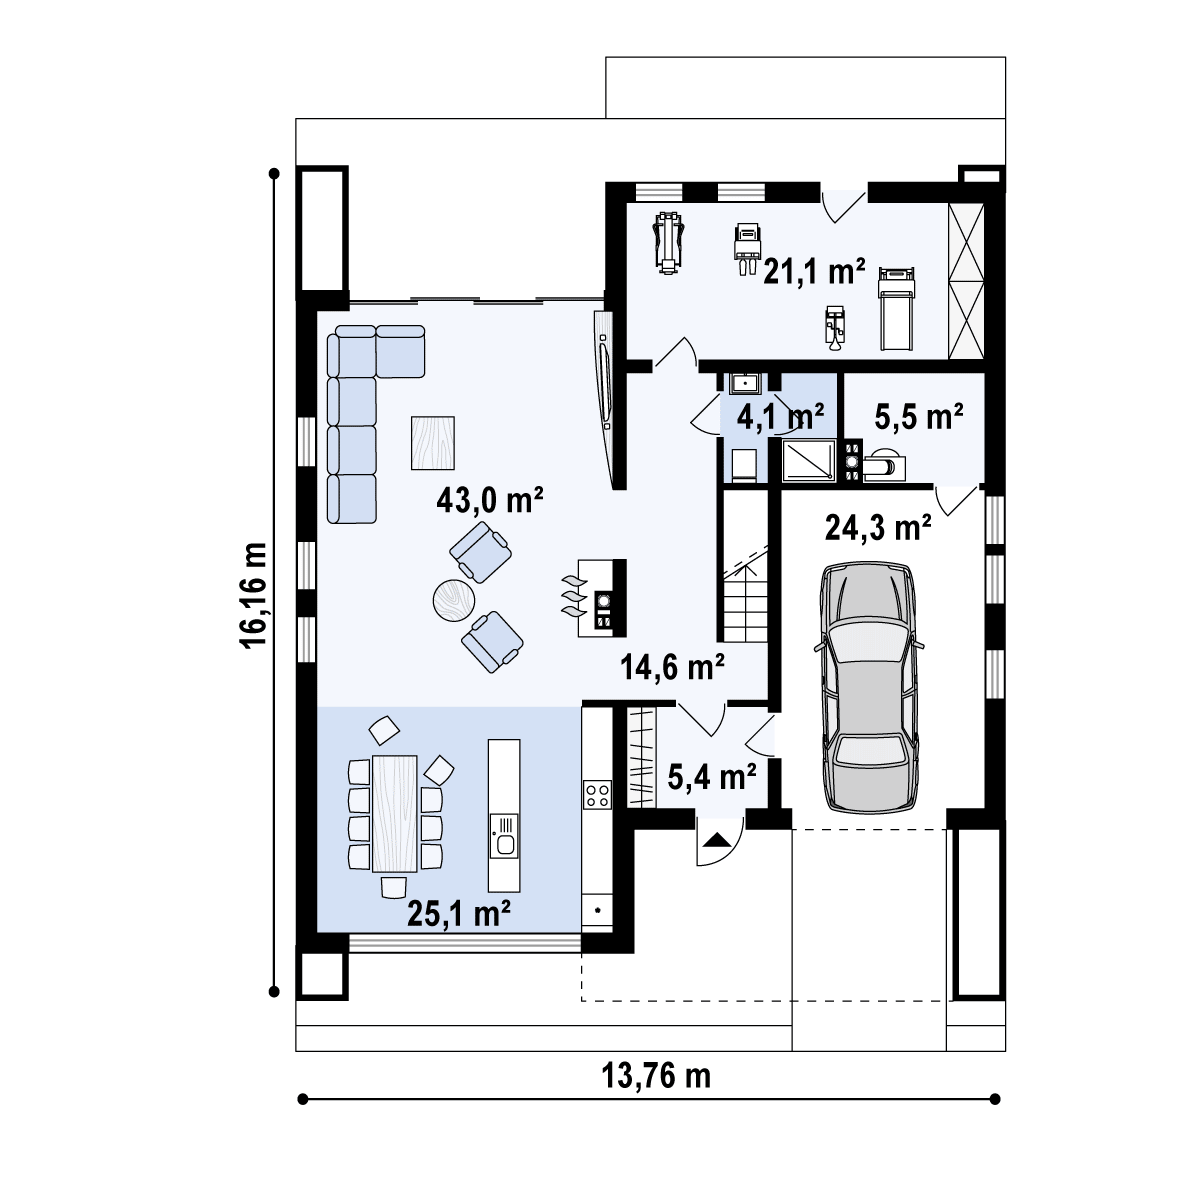 Zx123 планировка 2